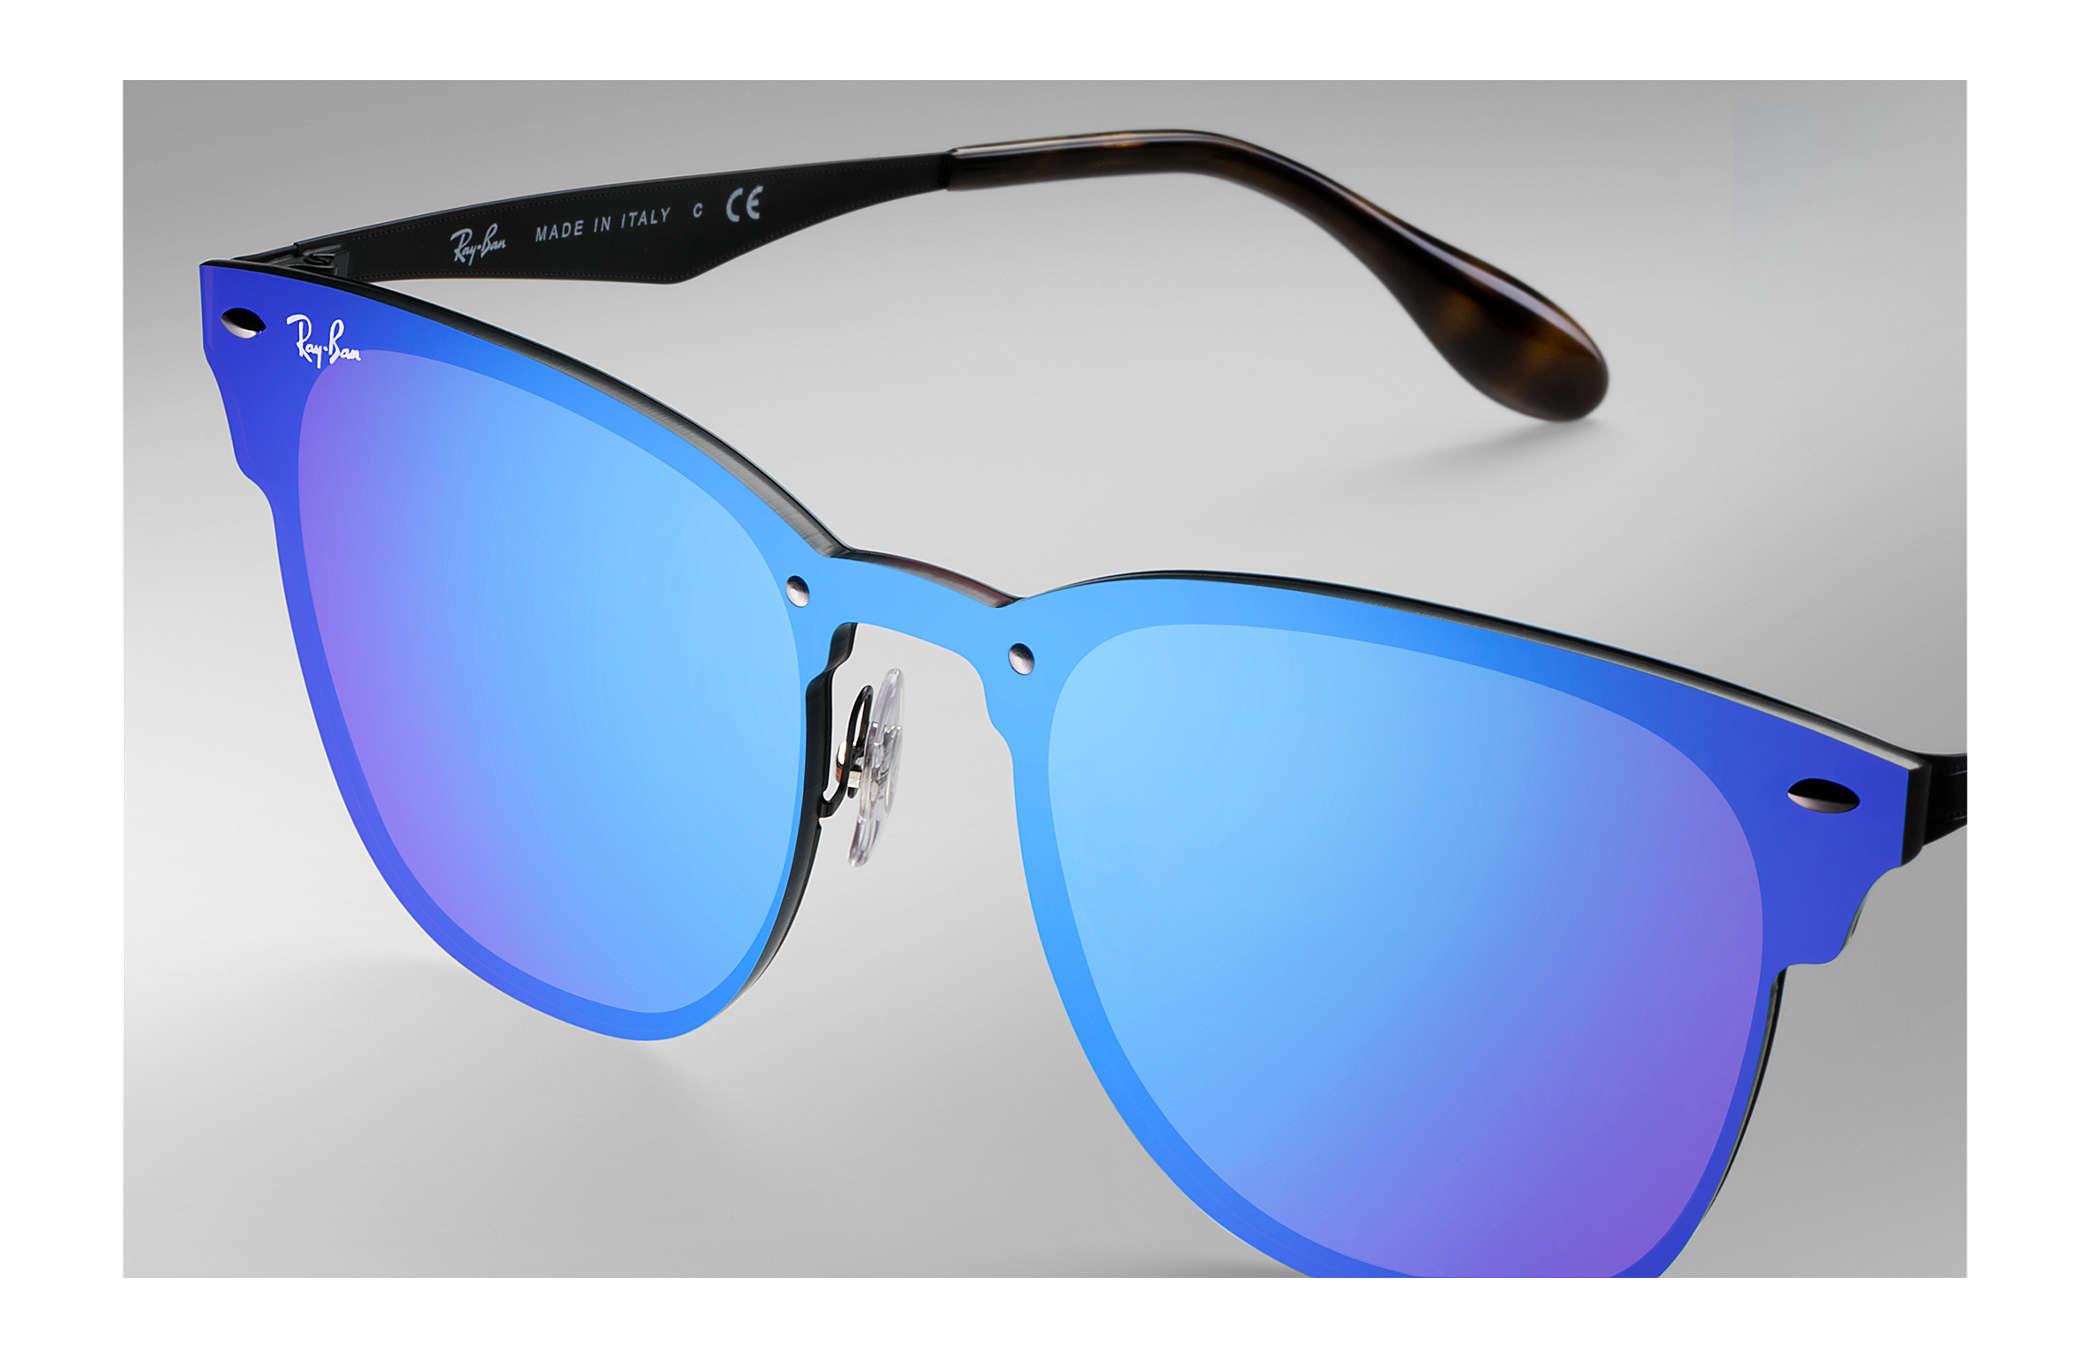 Ray-Ban Blaze Clubmaster RB3576N Preto - Metal - Lentes Violeta Azul ... 4839c4330a